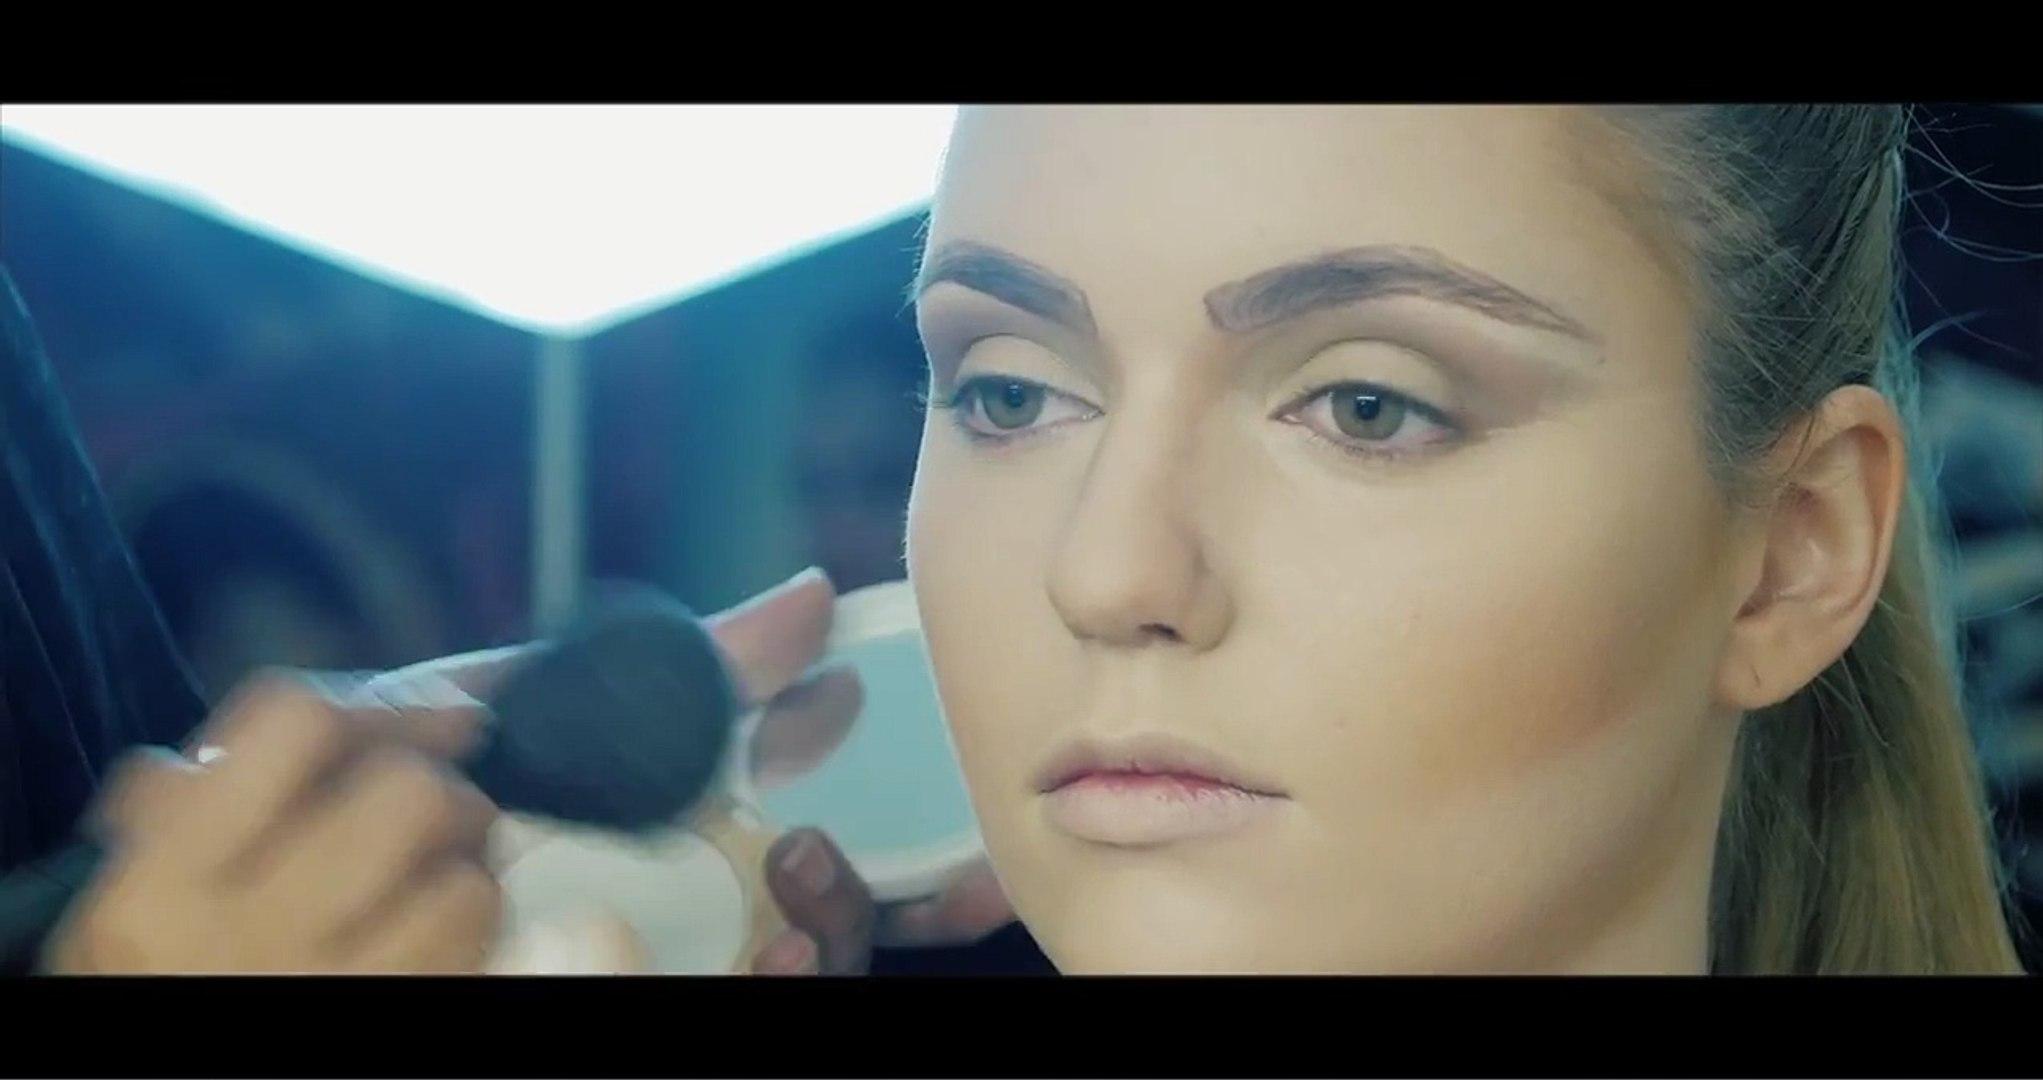 High Fashion Makeup For Fashion shoot